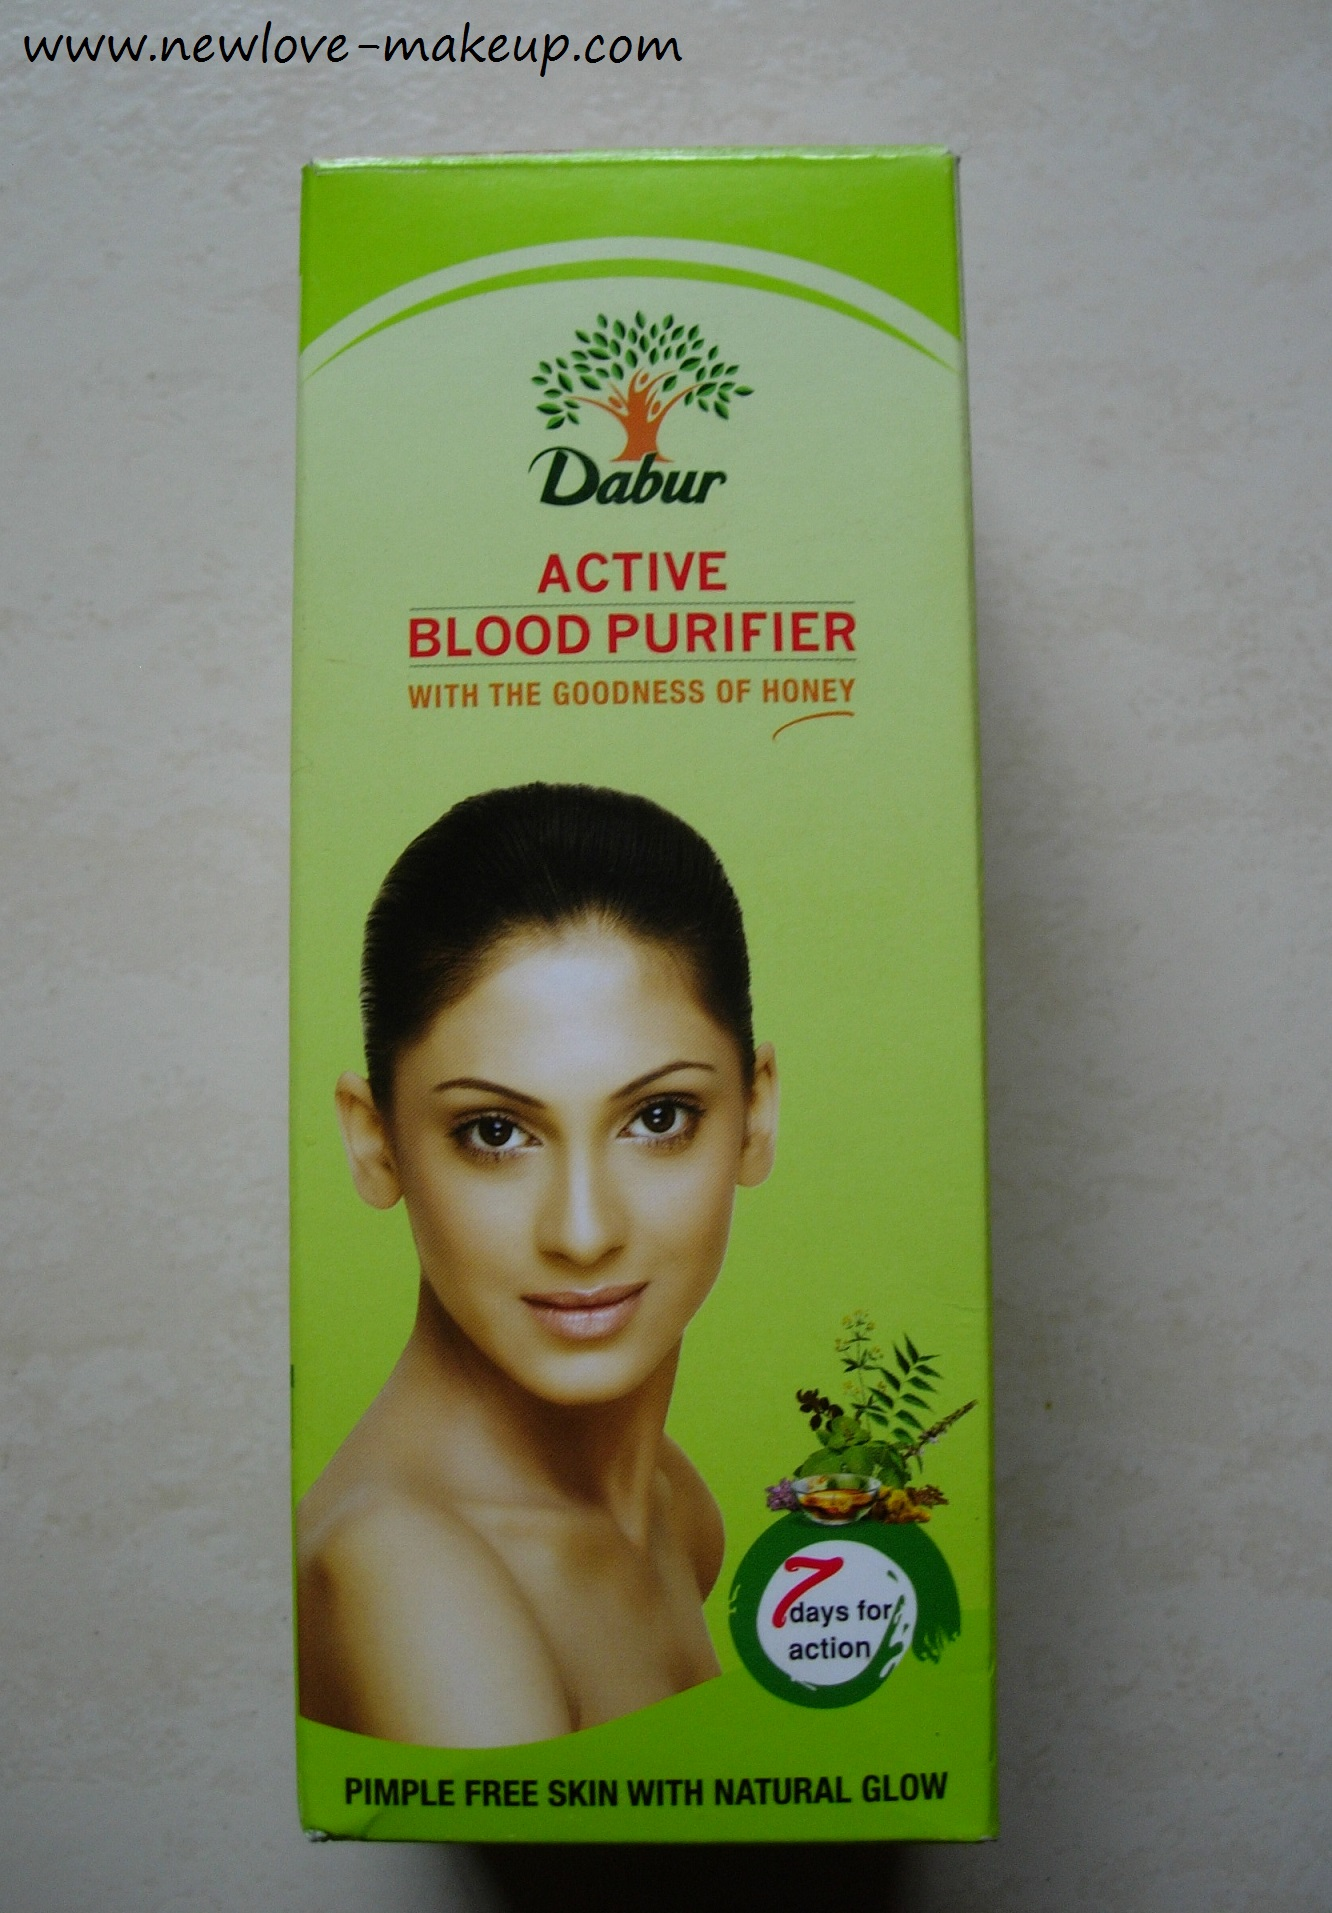 Dabur Active Blood Purifier Review | New Love - Makeup